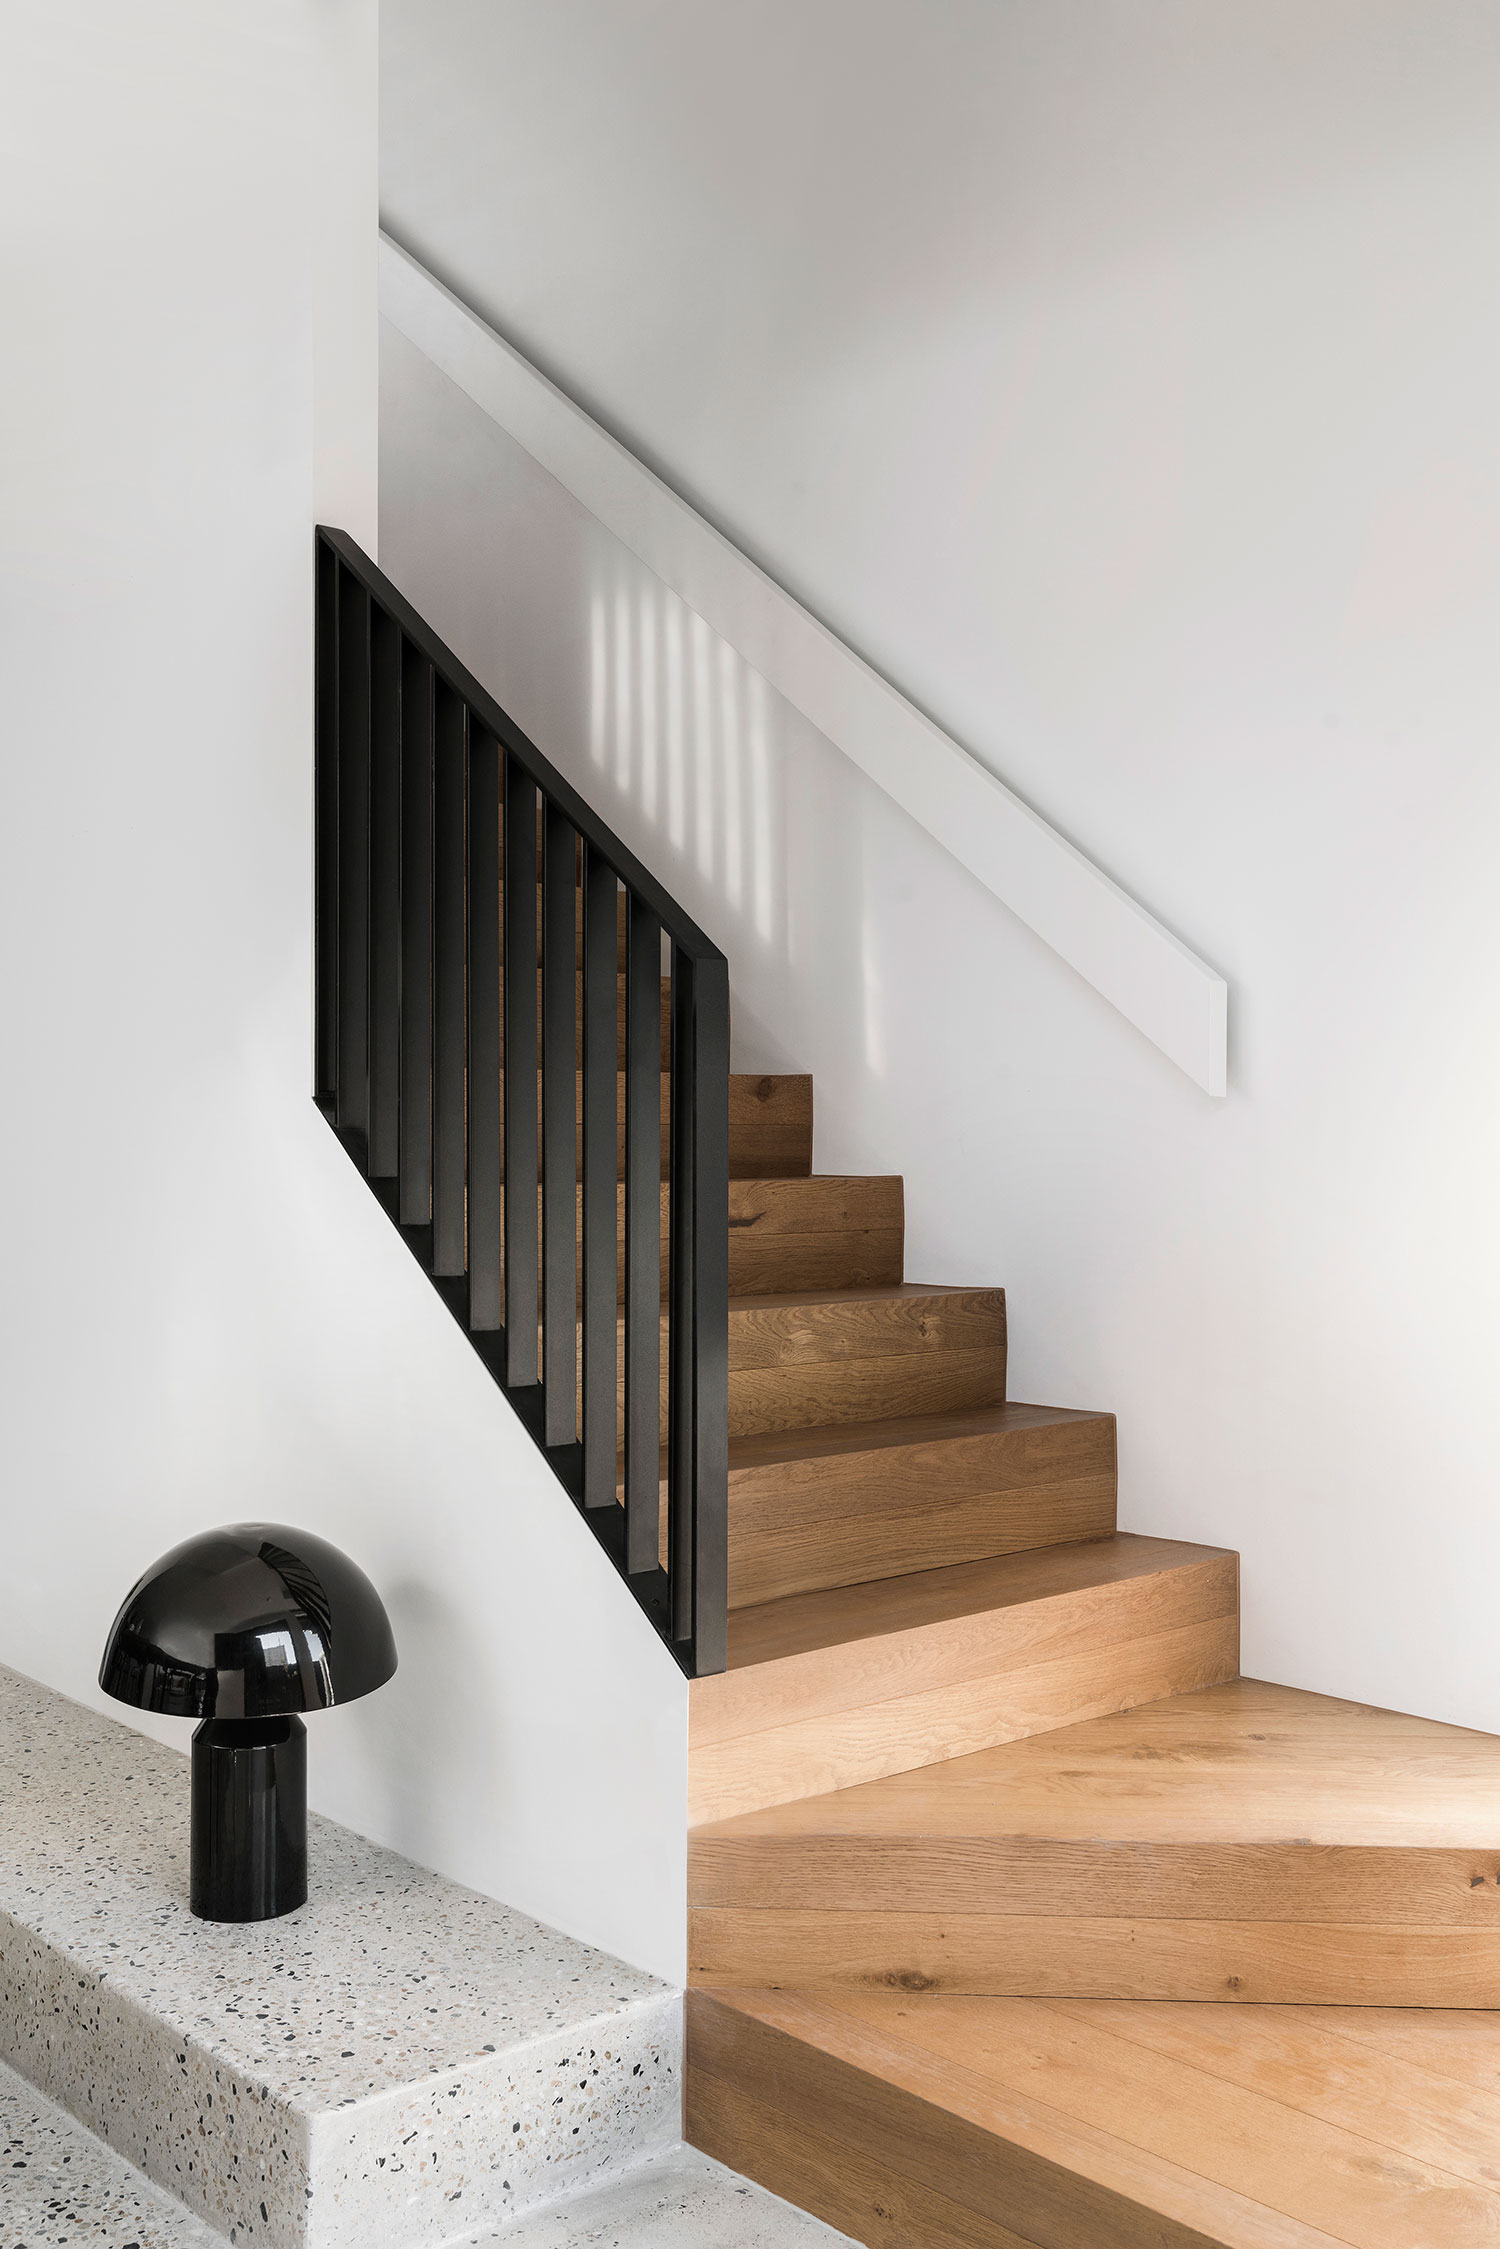 osborne-townhouse-interior-design-staircase-ckariouz-architects3